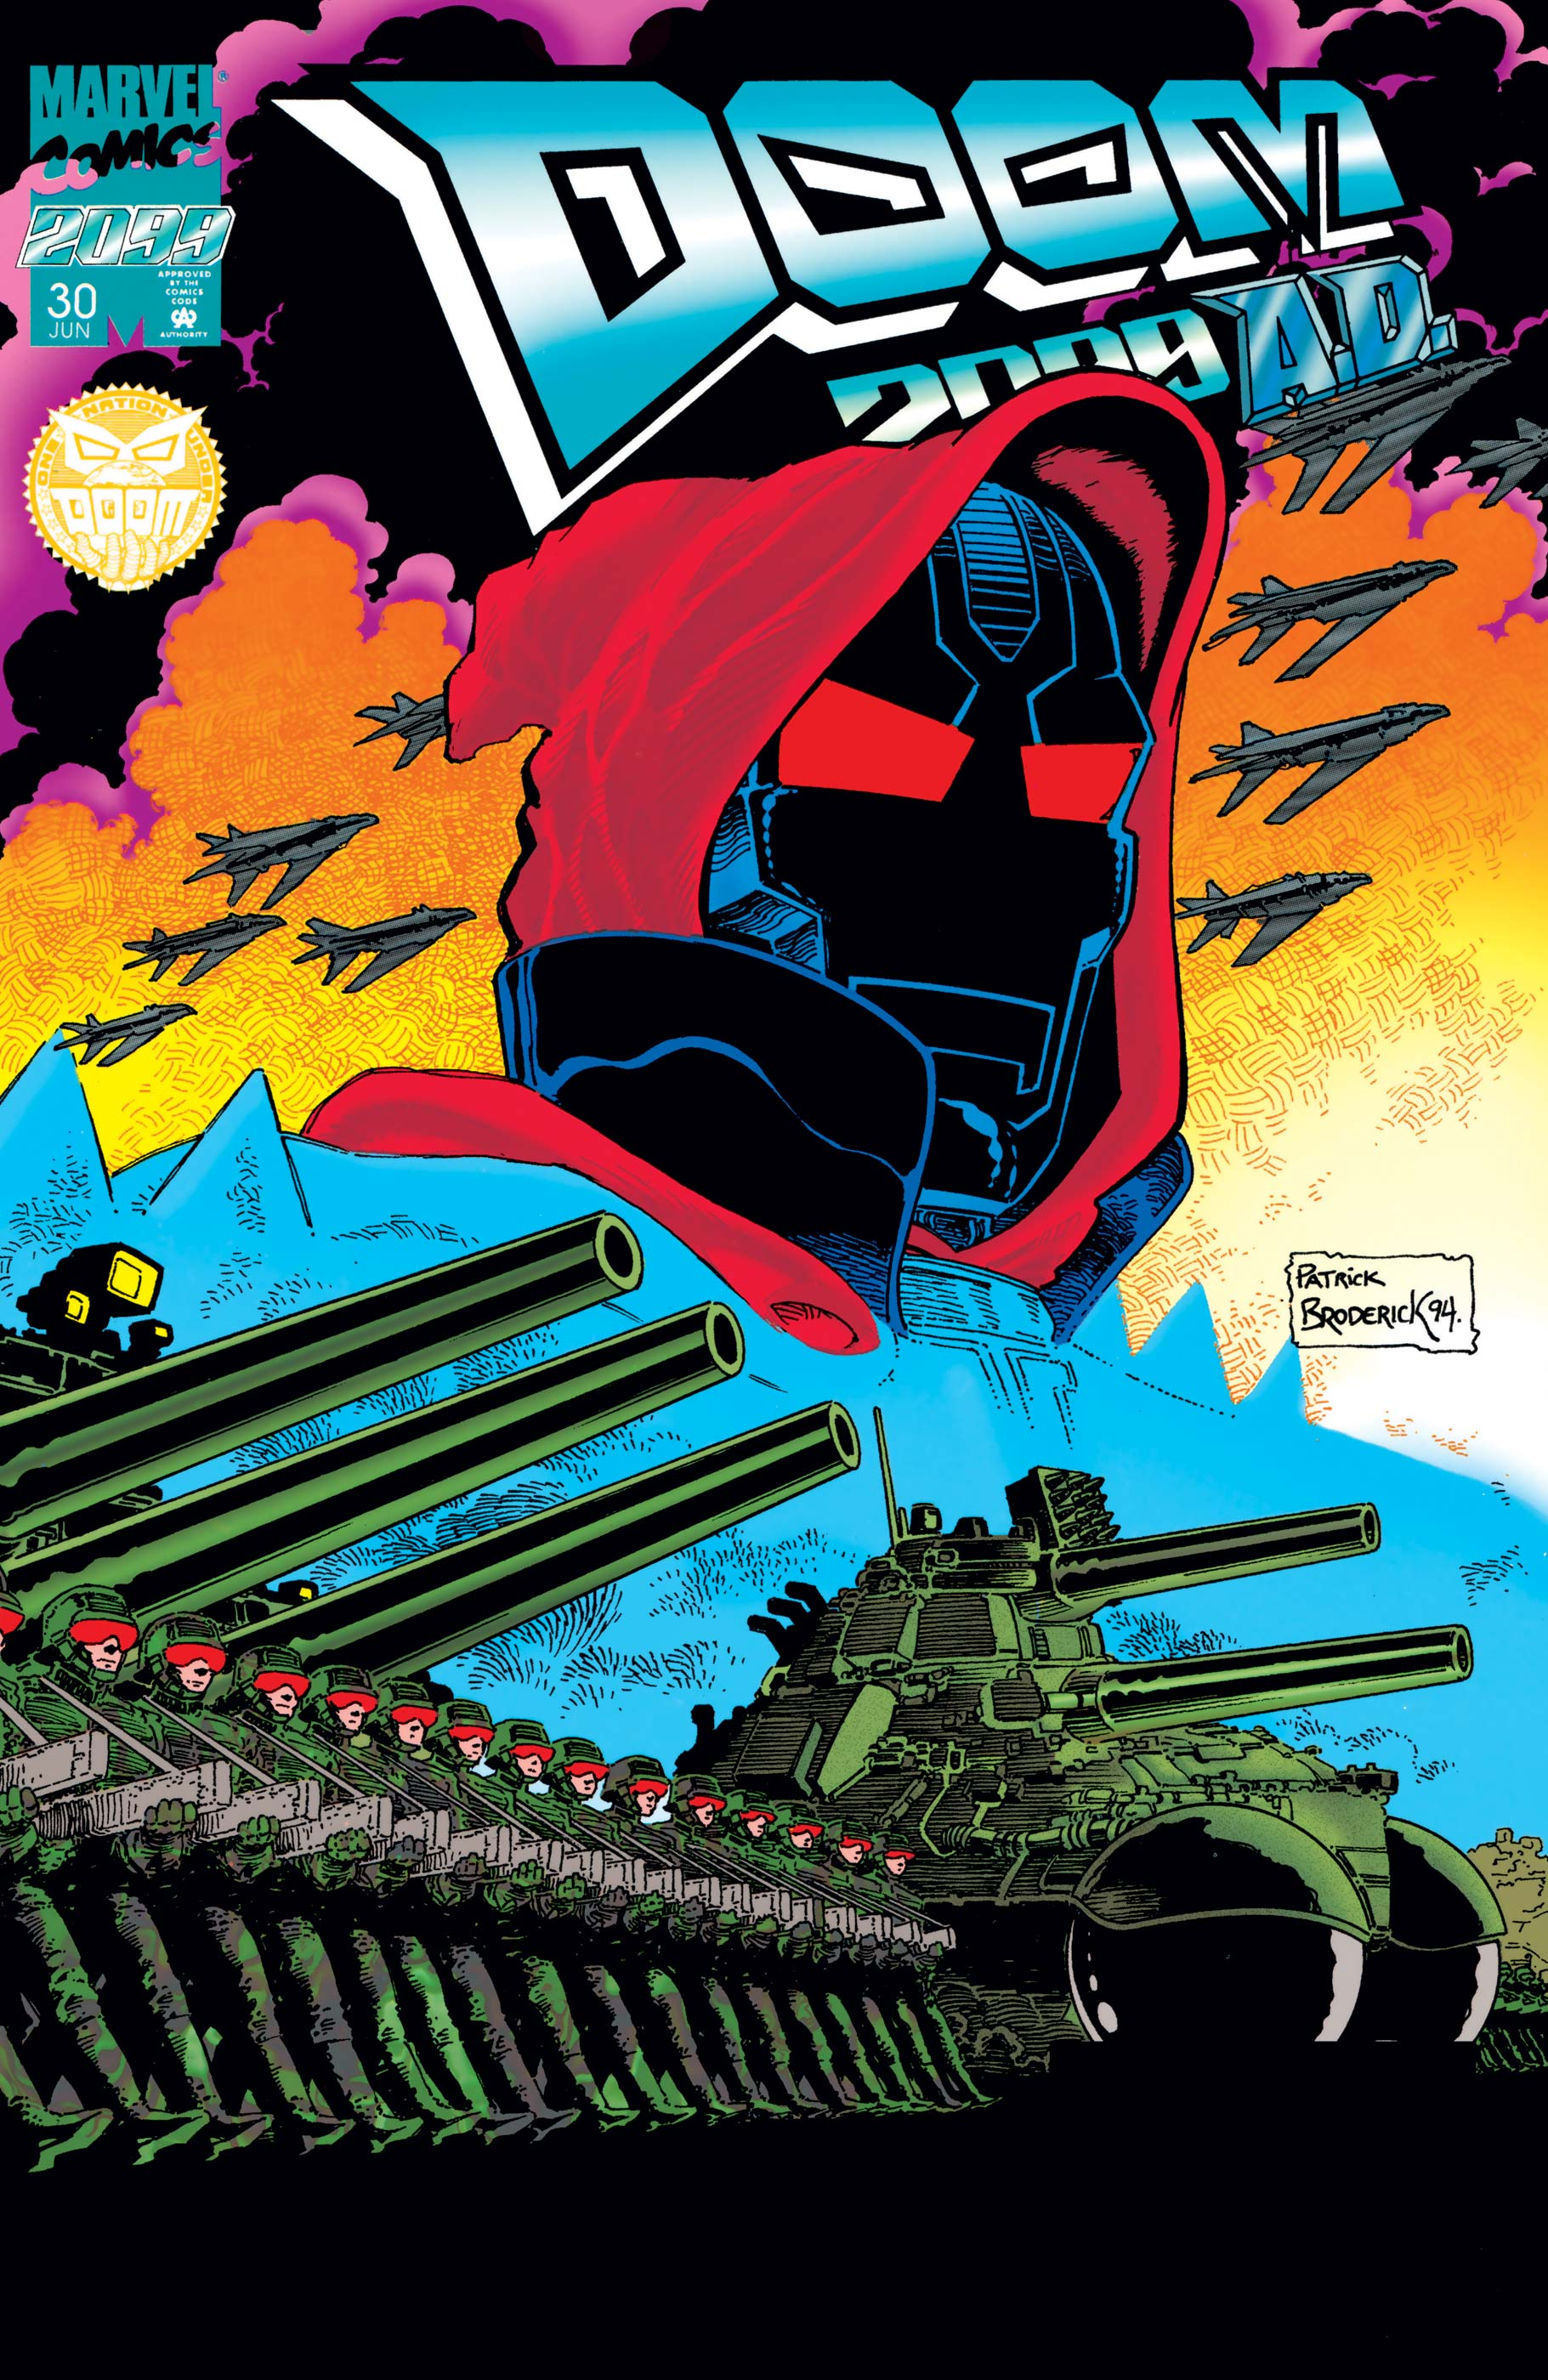 Doom 2099 (1993) #30